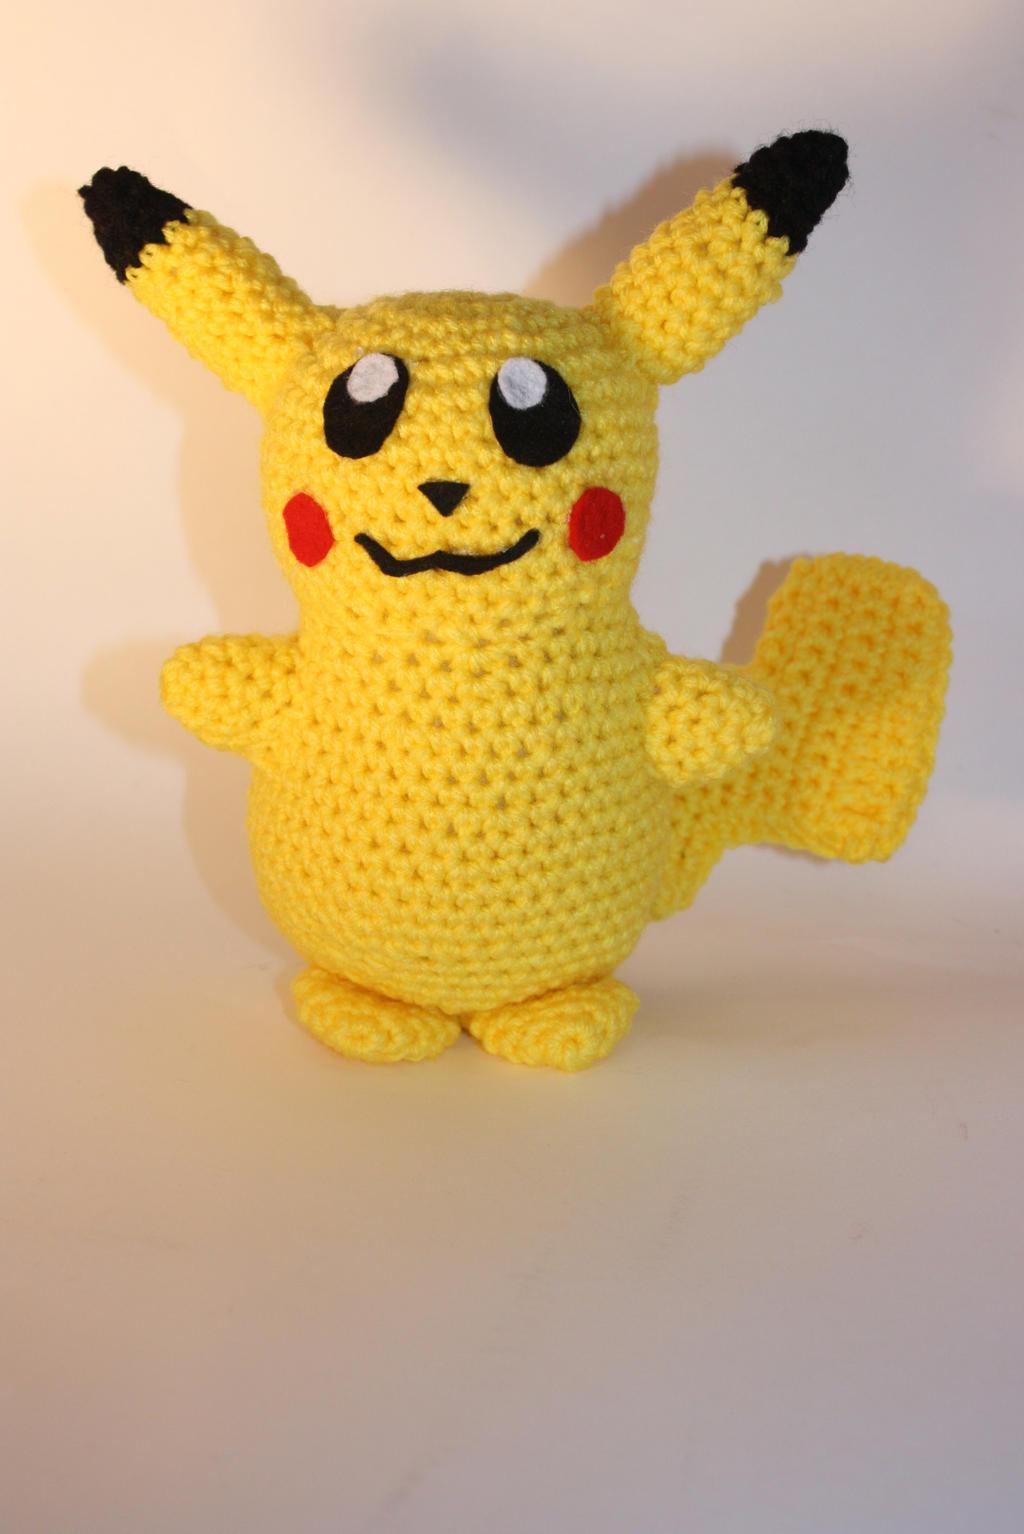 Crochet Pikachu Amigurumi by DunnWithLove on deviantART